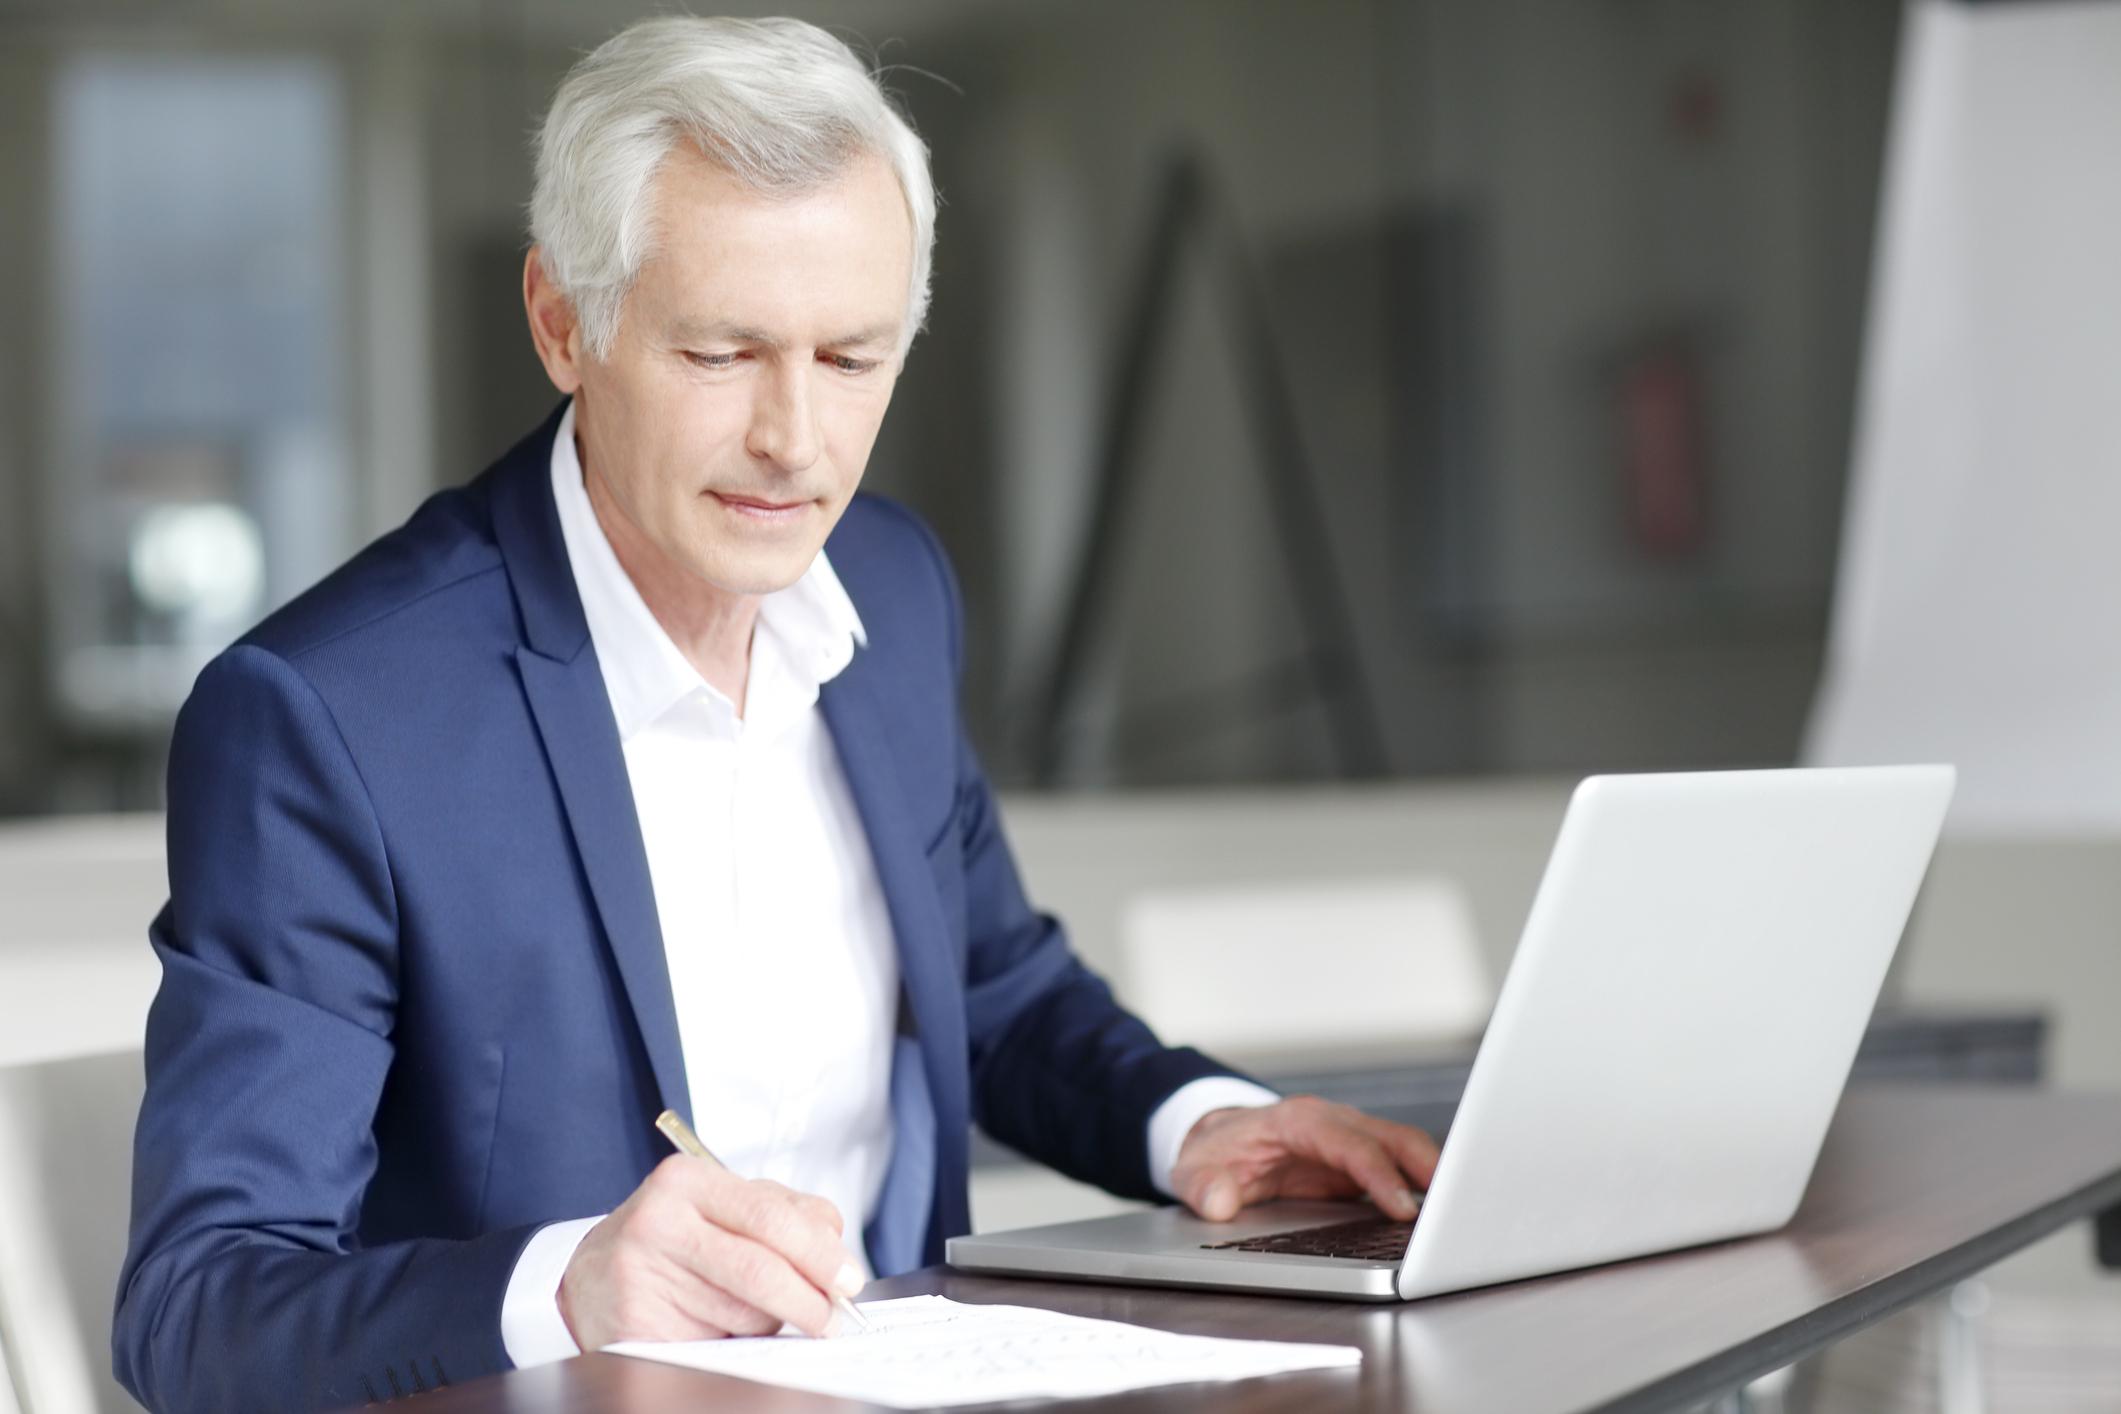 Older man working on a laptop